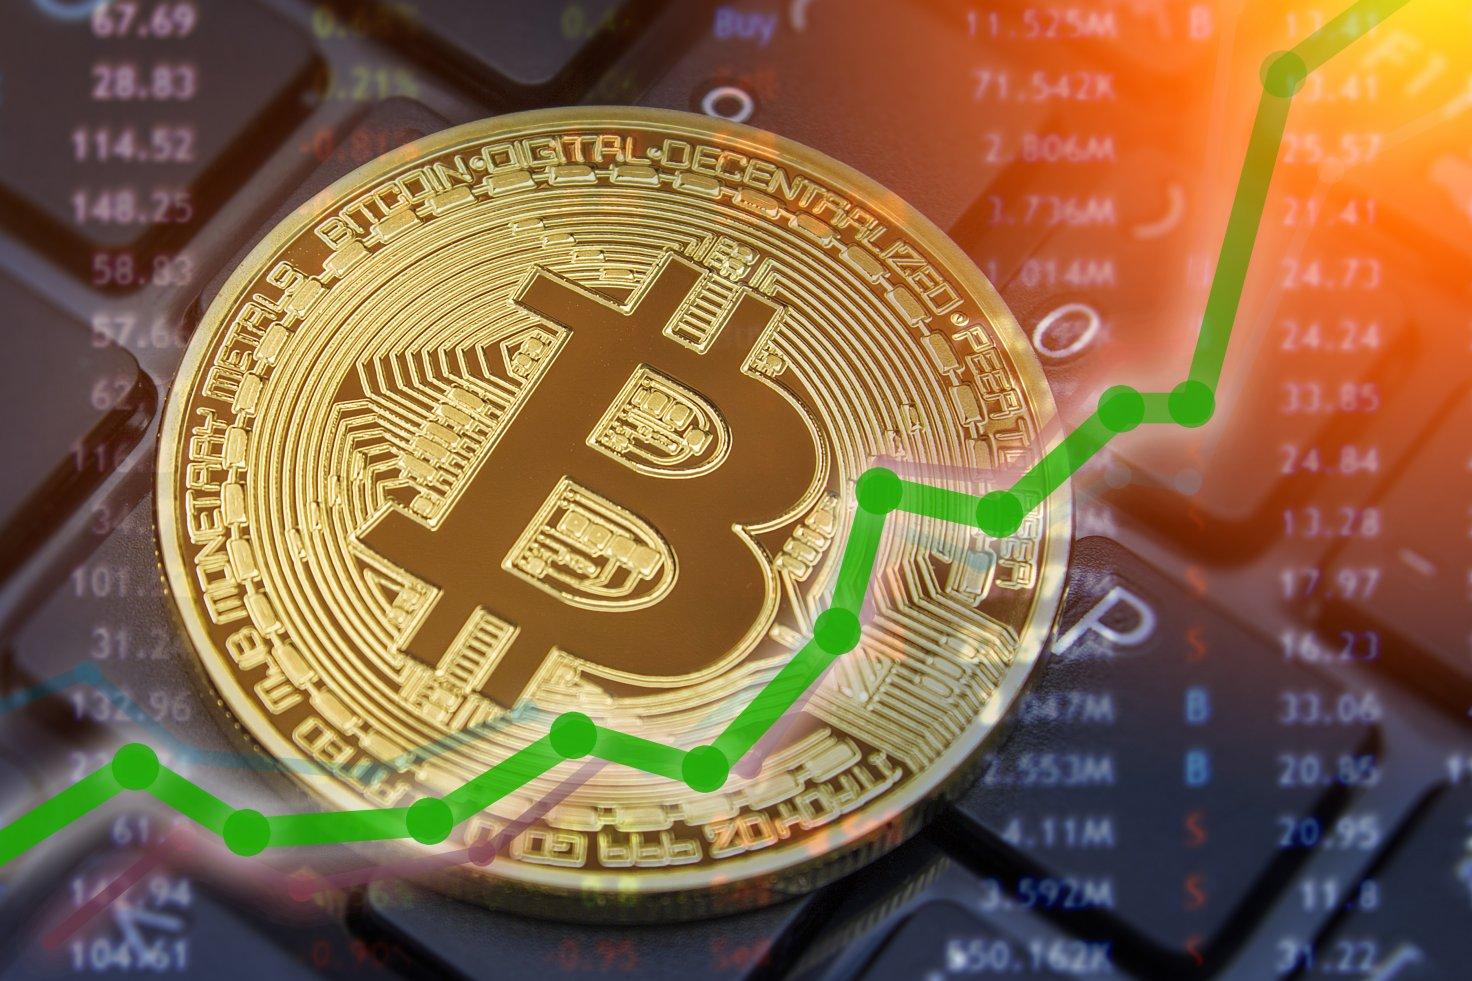 10 aud į btc bitcoin android programa